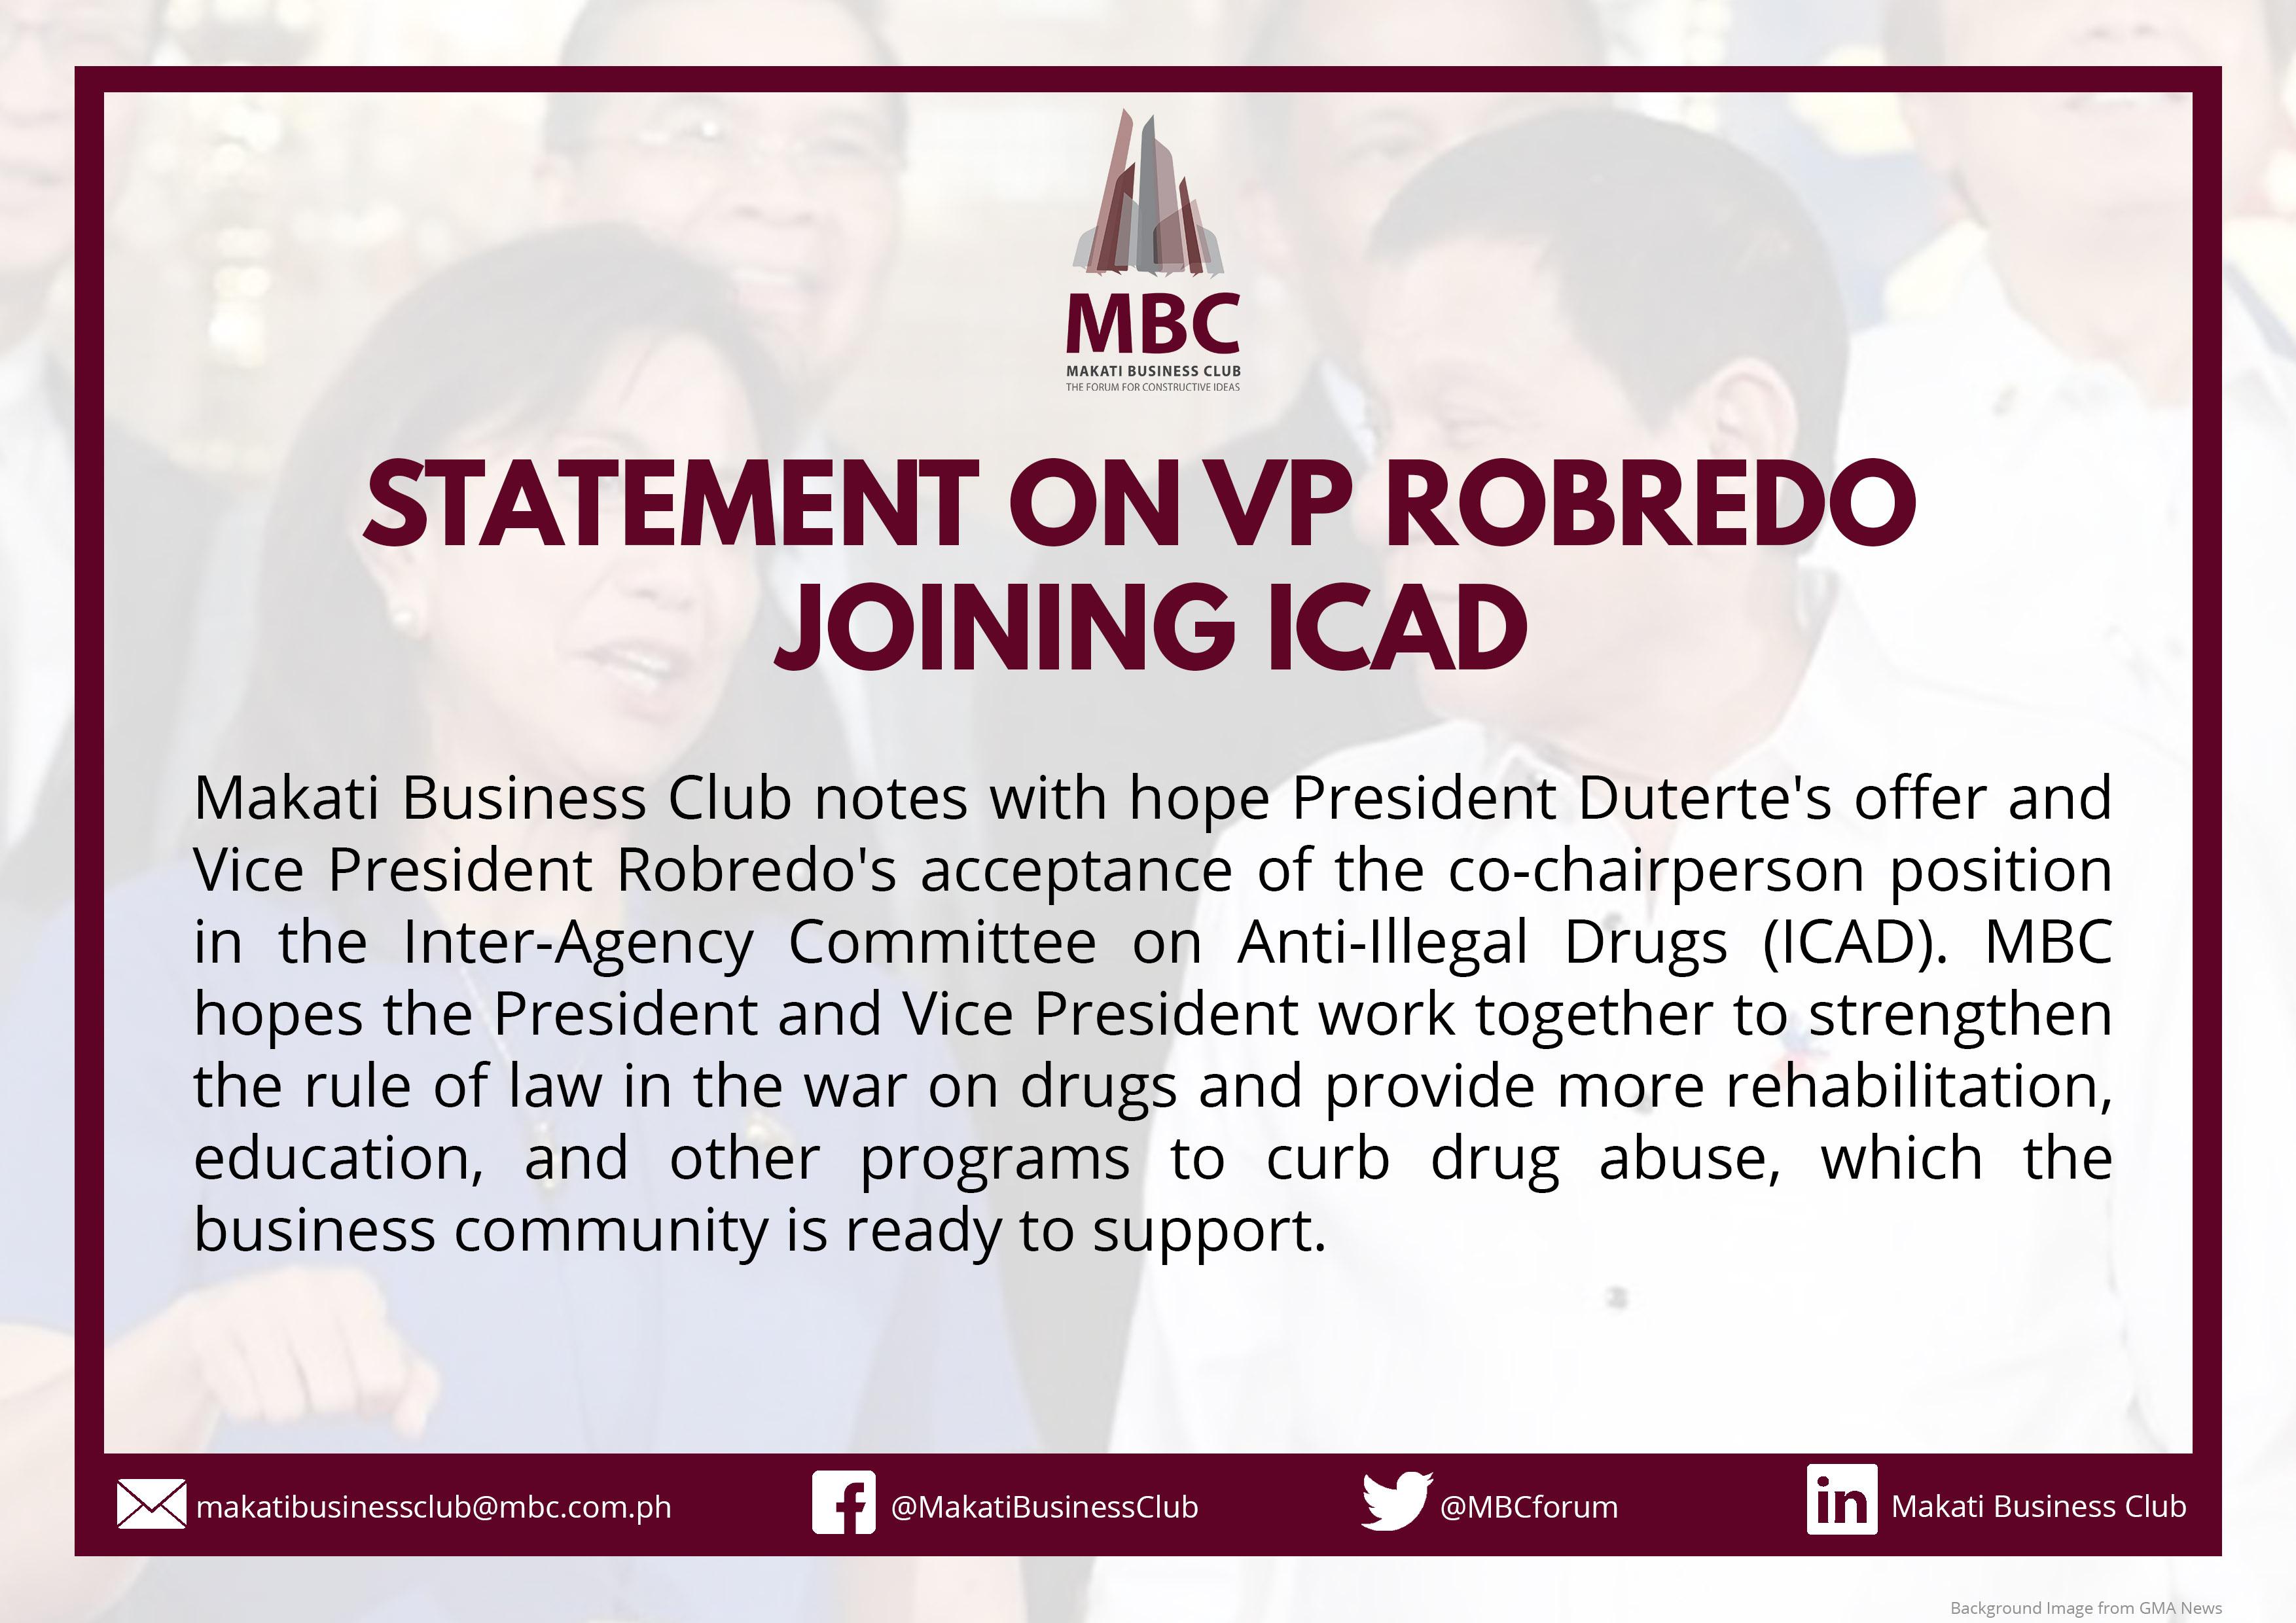 Statement on VP Robredo Joining ICAD